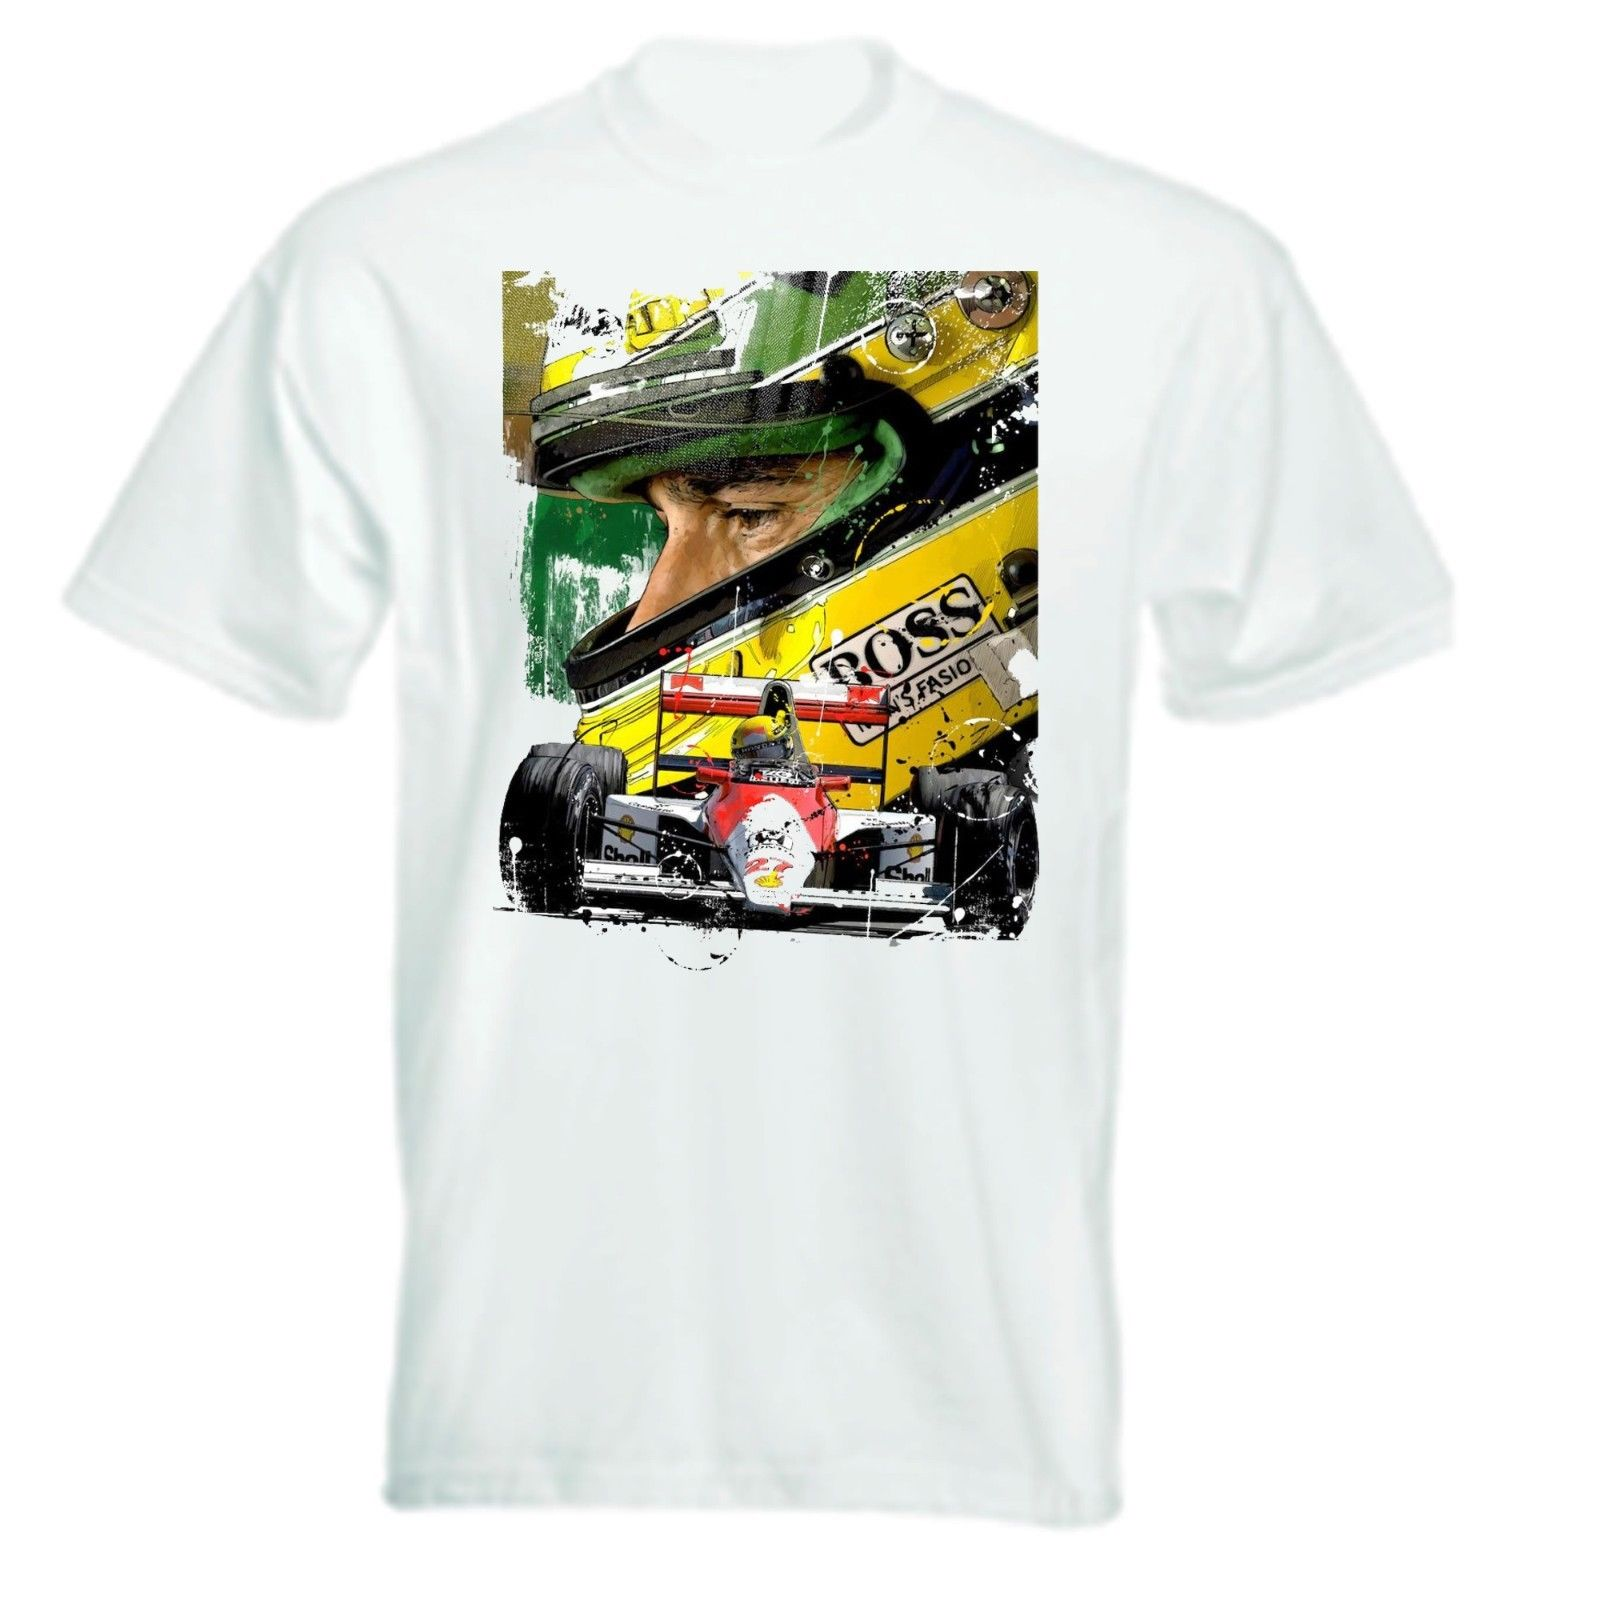 ayrton-senna-camiseta-de-manga-corta-de-algodon-para-hombre-divertida-camiseta-informal-con-cuello-redondo